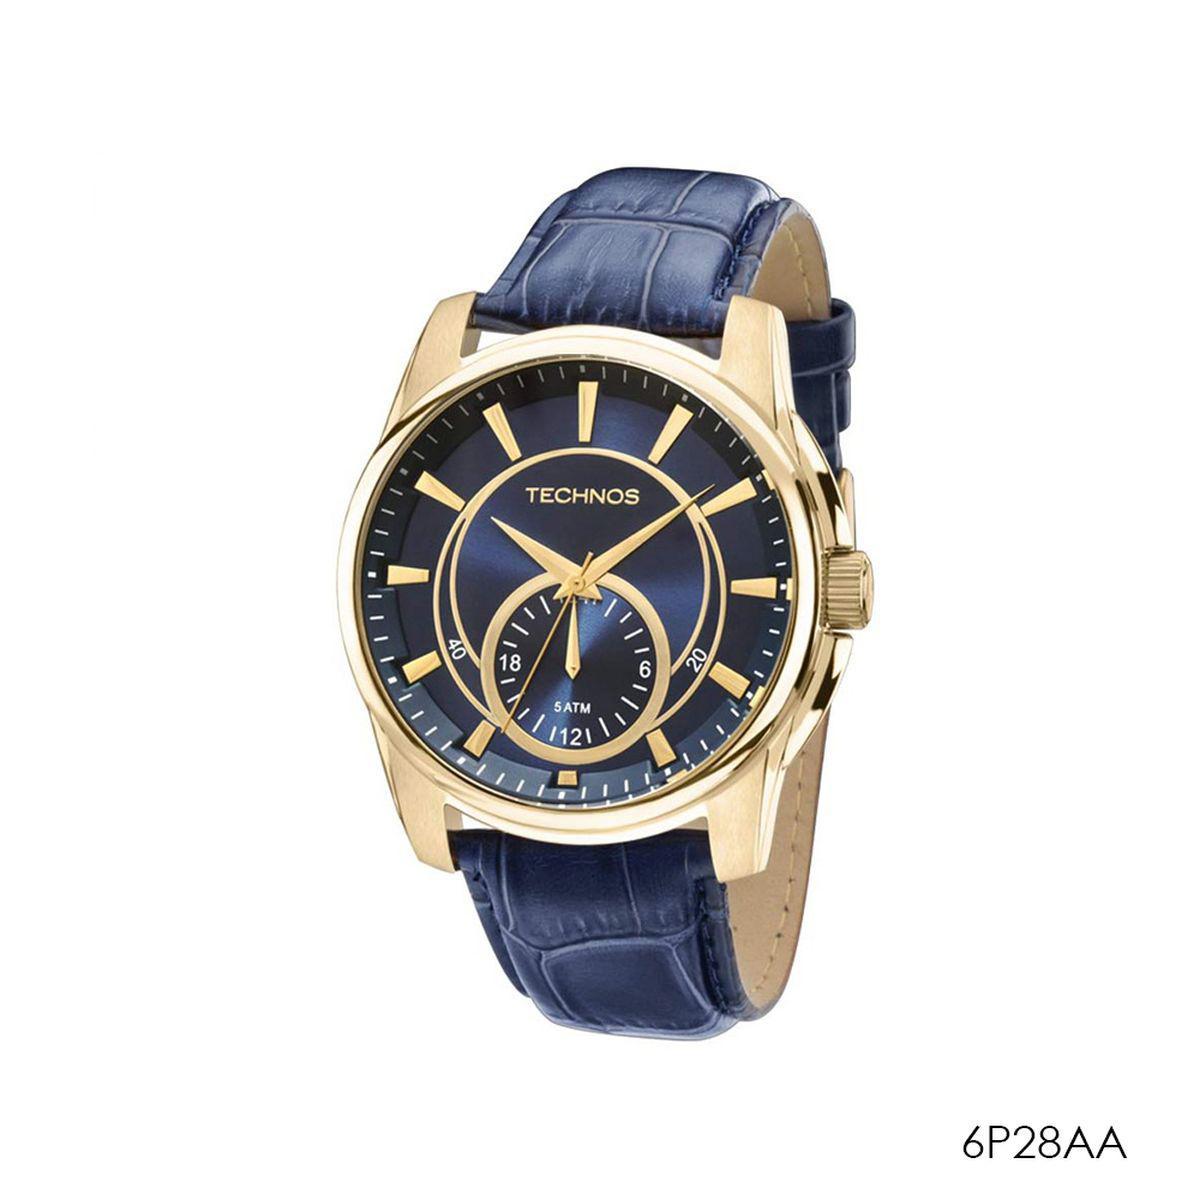 b2a1482ee1c Relogio technos azul 6p28aa - Relógio Masculino - Magazine Luiza